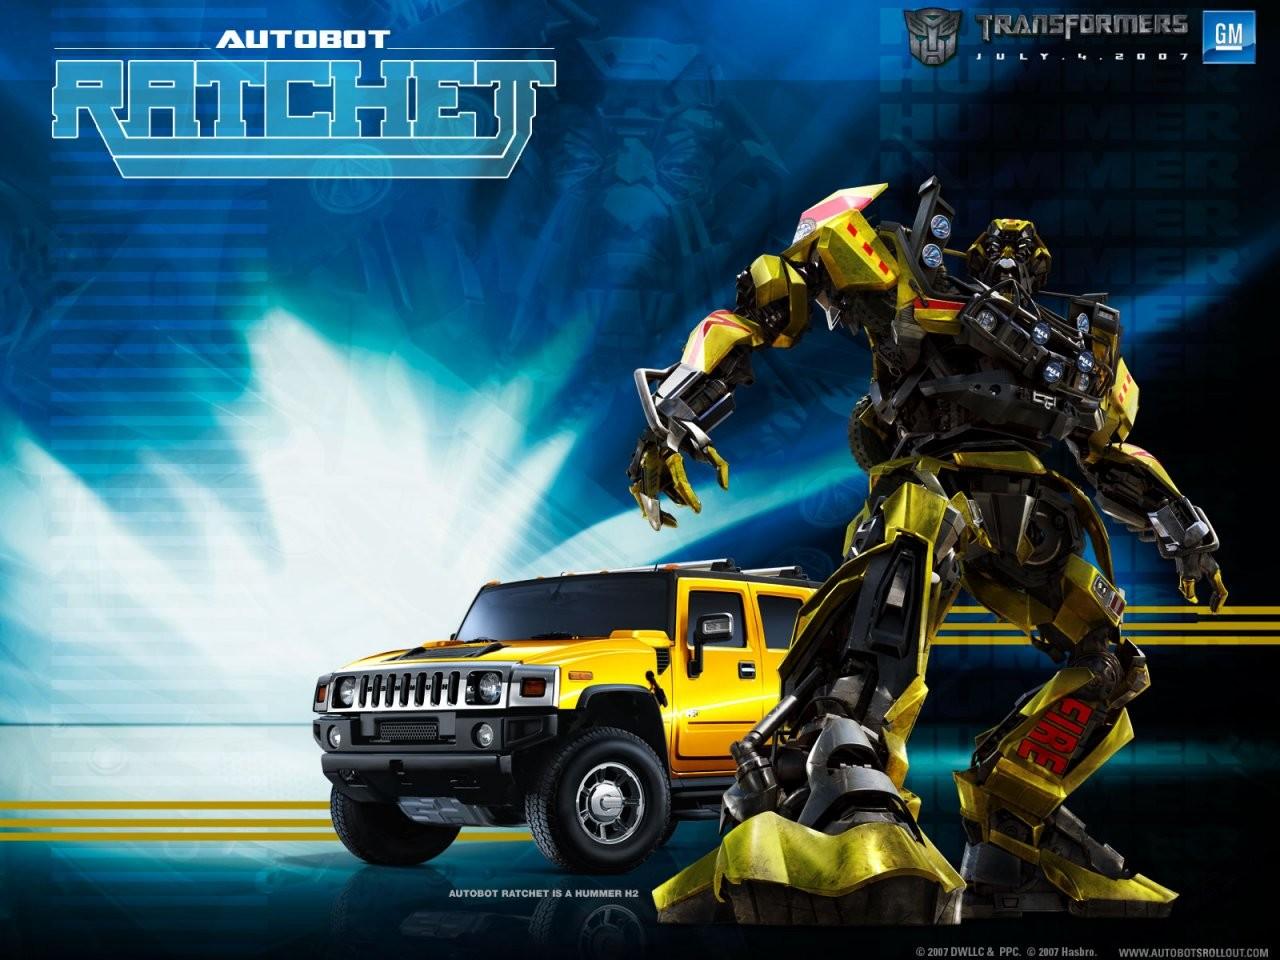 Wallpapers Dekstop 4 U Transformers Wallpaper 1280x960